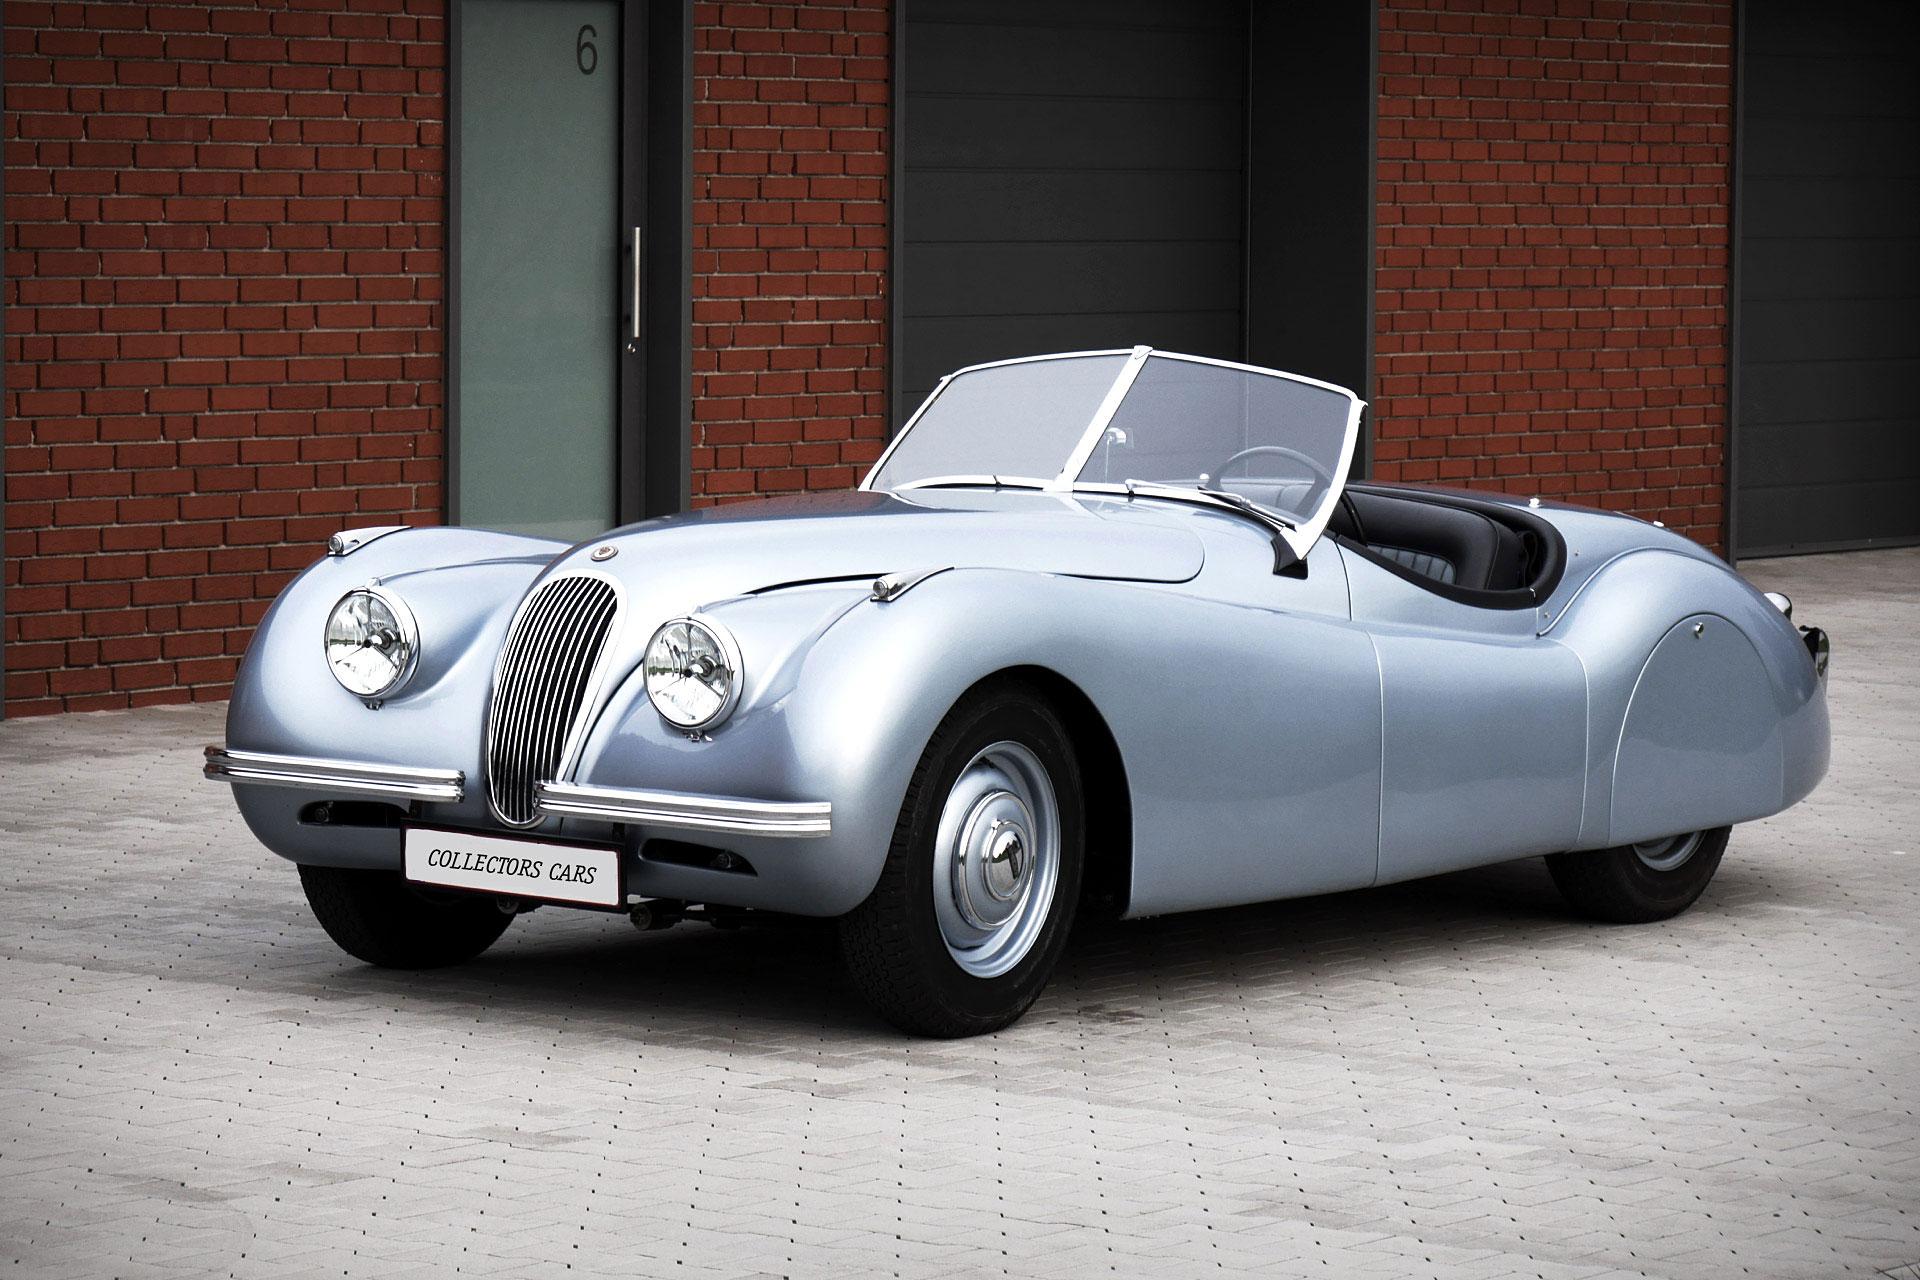 1950 Jaguar Xk120 Alloy Roadster Uncrate